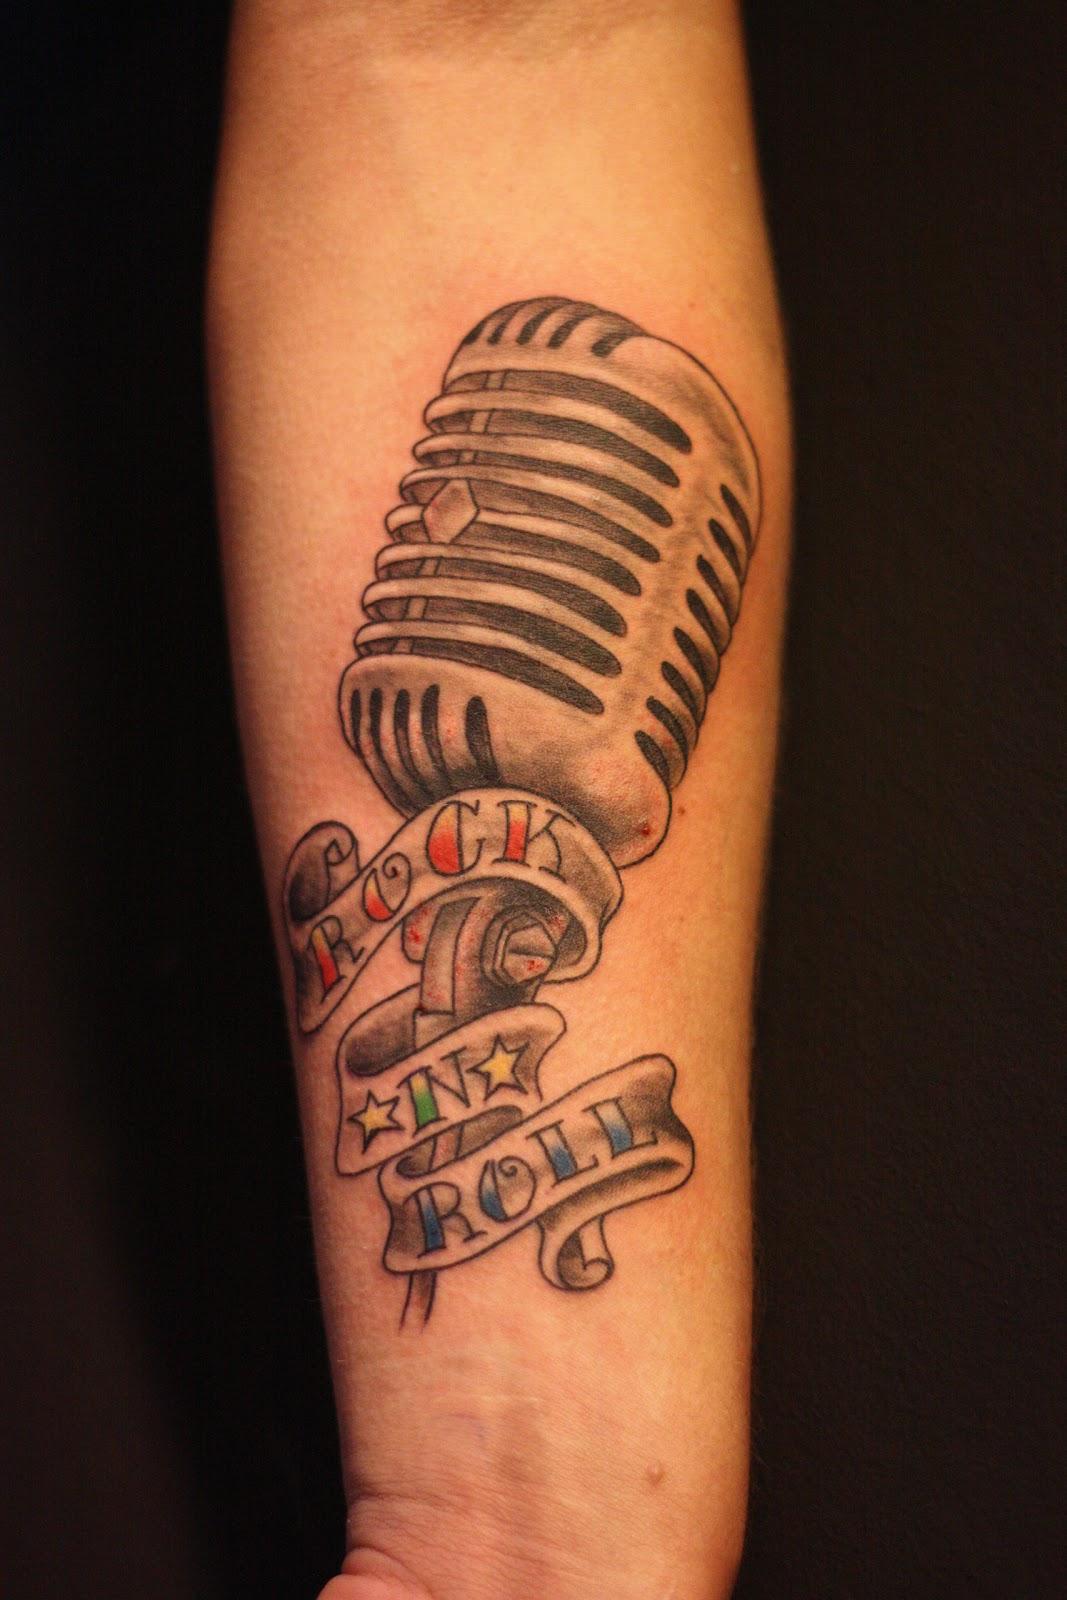 ink tattoo old school mic shure microphone 50 tals mick. Black Bedroom Furniture Sets. Home Design Ideas